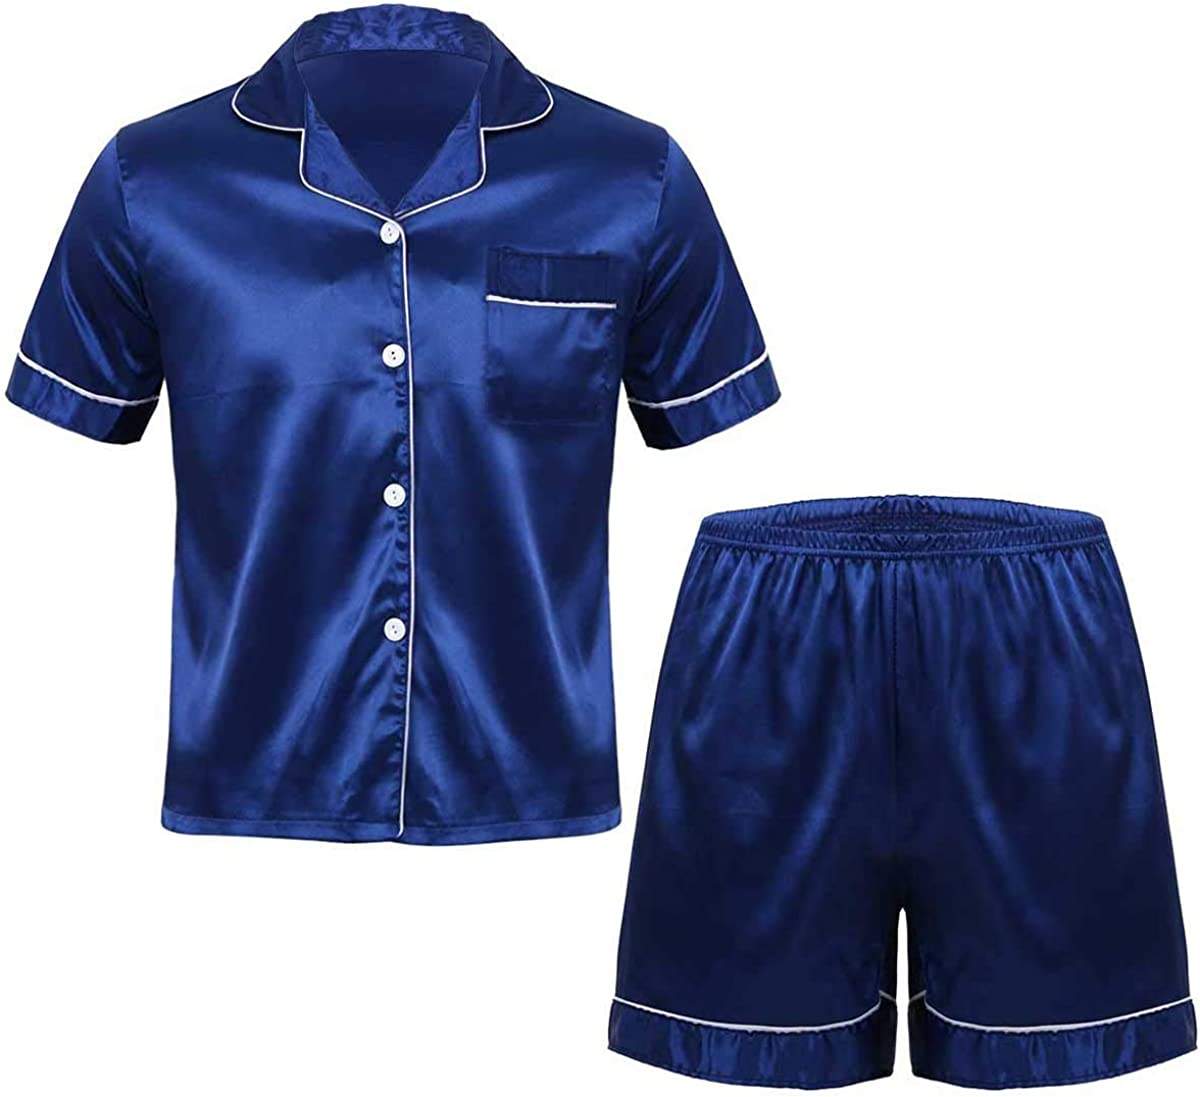 Haitryli Mens Silky Satin Pajamas Set Notch Collar Short Sleeves Button Down Shirt Top Boxer Shorts Sleepwear Loungewear